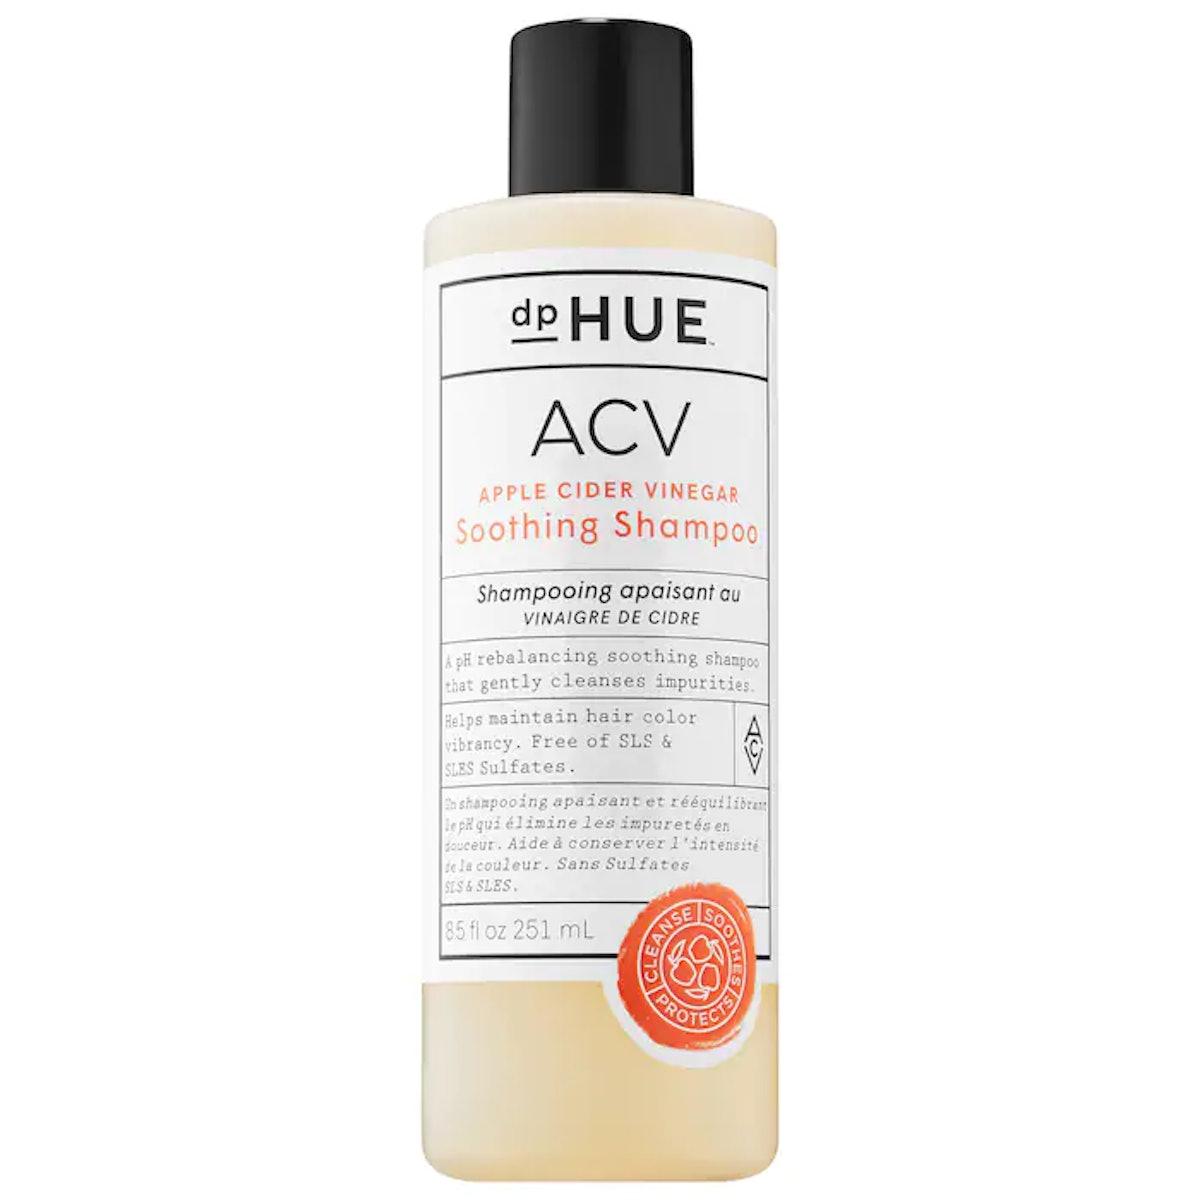 Apple Cider Vinegar Soothing Shampoo